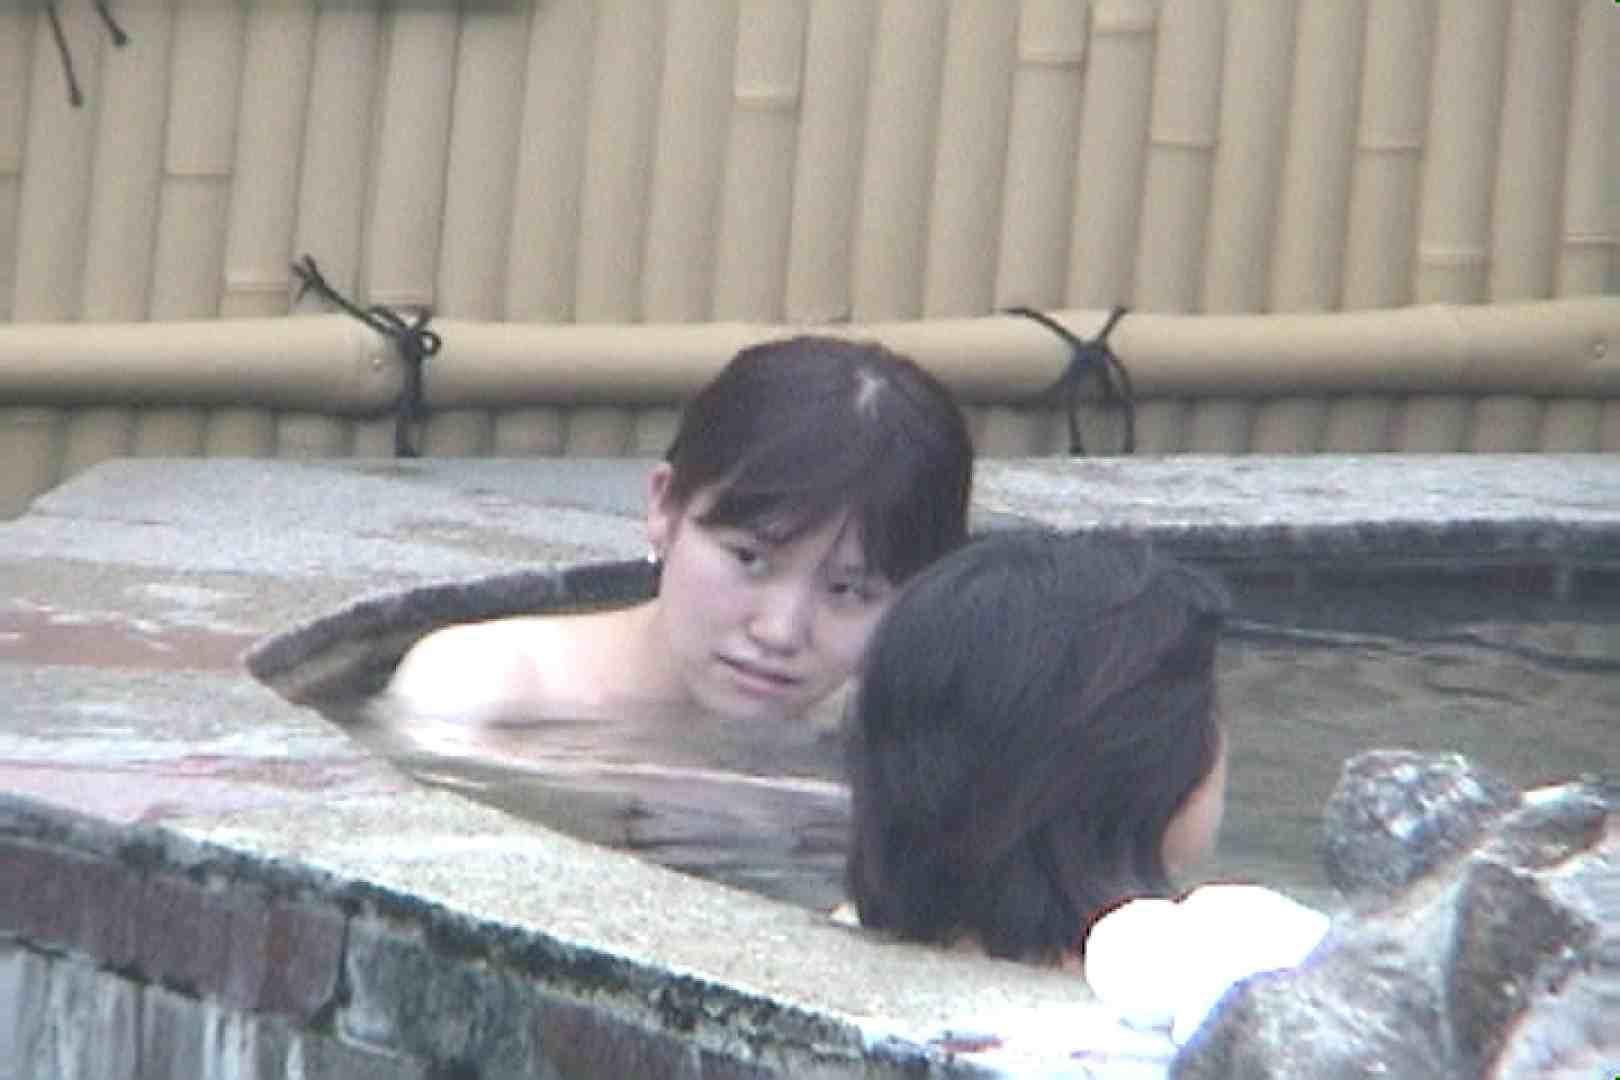 Aquaな露天風呂Vol.79【VIP限定】 盗撮 | HなOL  100pic 15